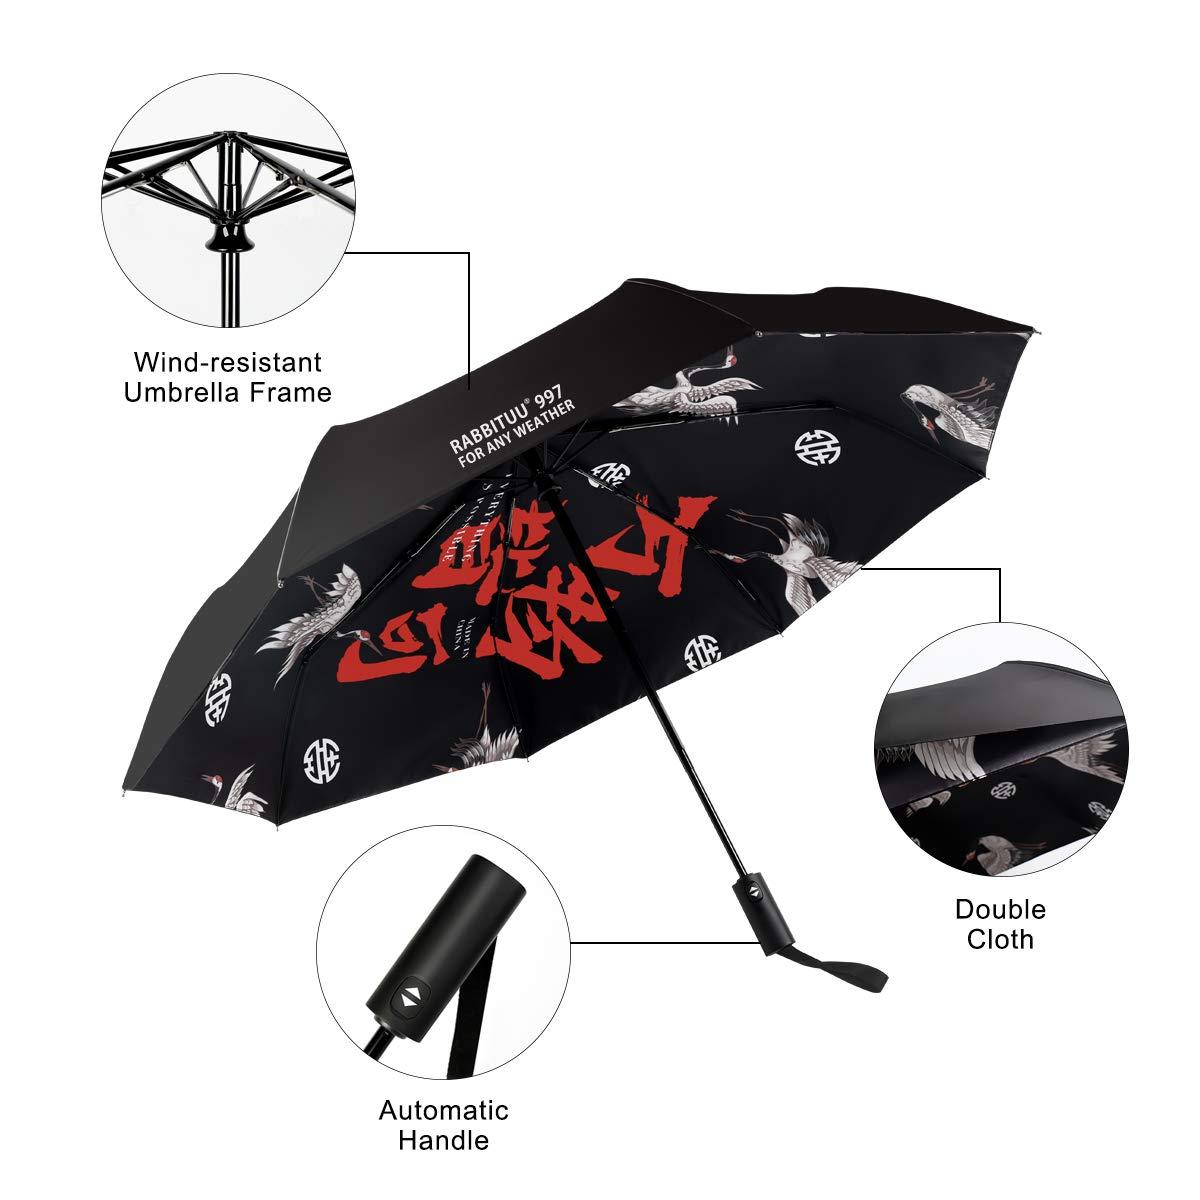 fff22b0ac8dd Rabbituu Windproof Travel Umbrella Compact Lightweight Folding Portable  Automatic Open Close Double Canopy Sun or Rain Totes Outdoor Car Umbrellas  8 ...